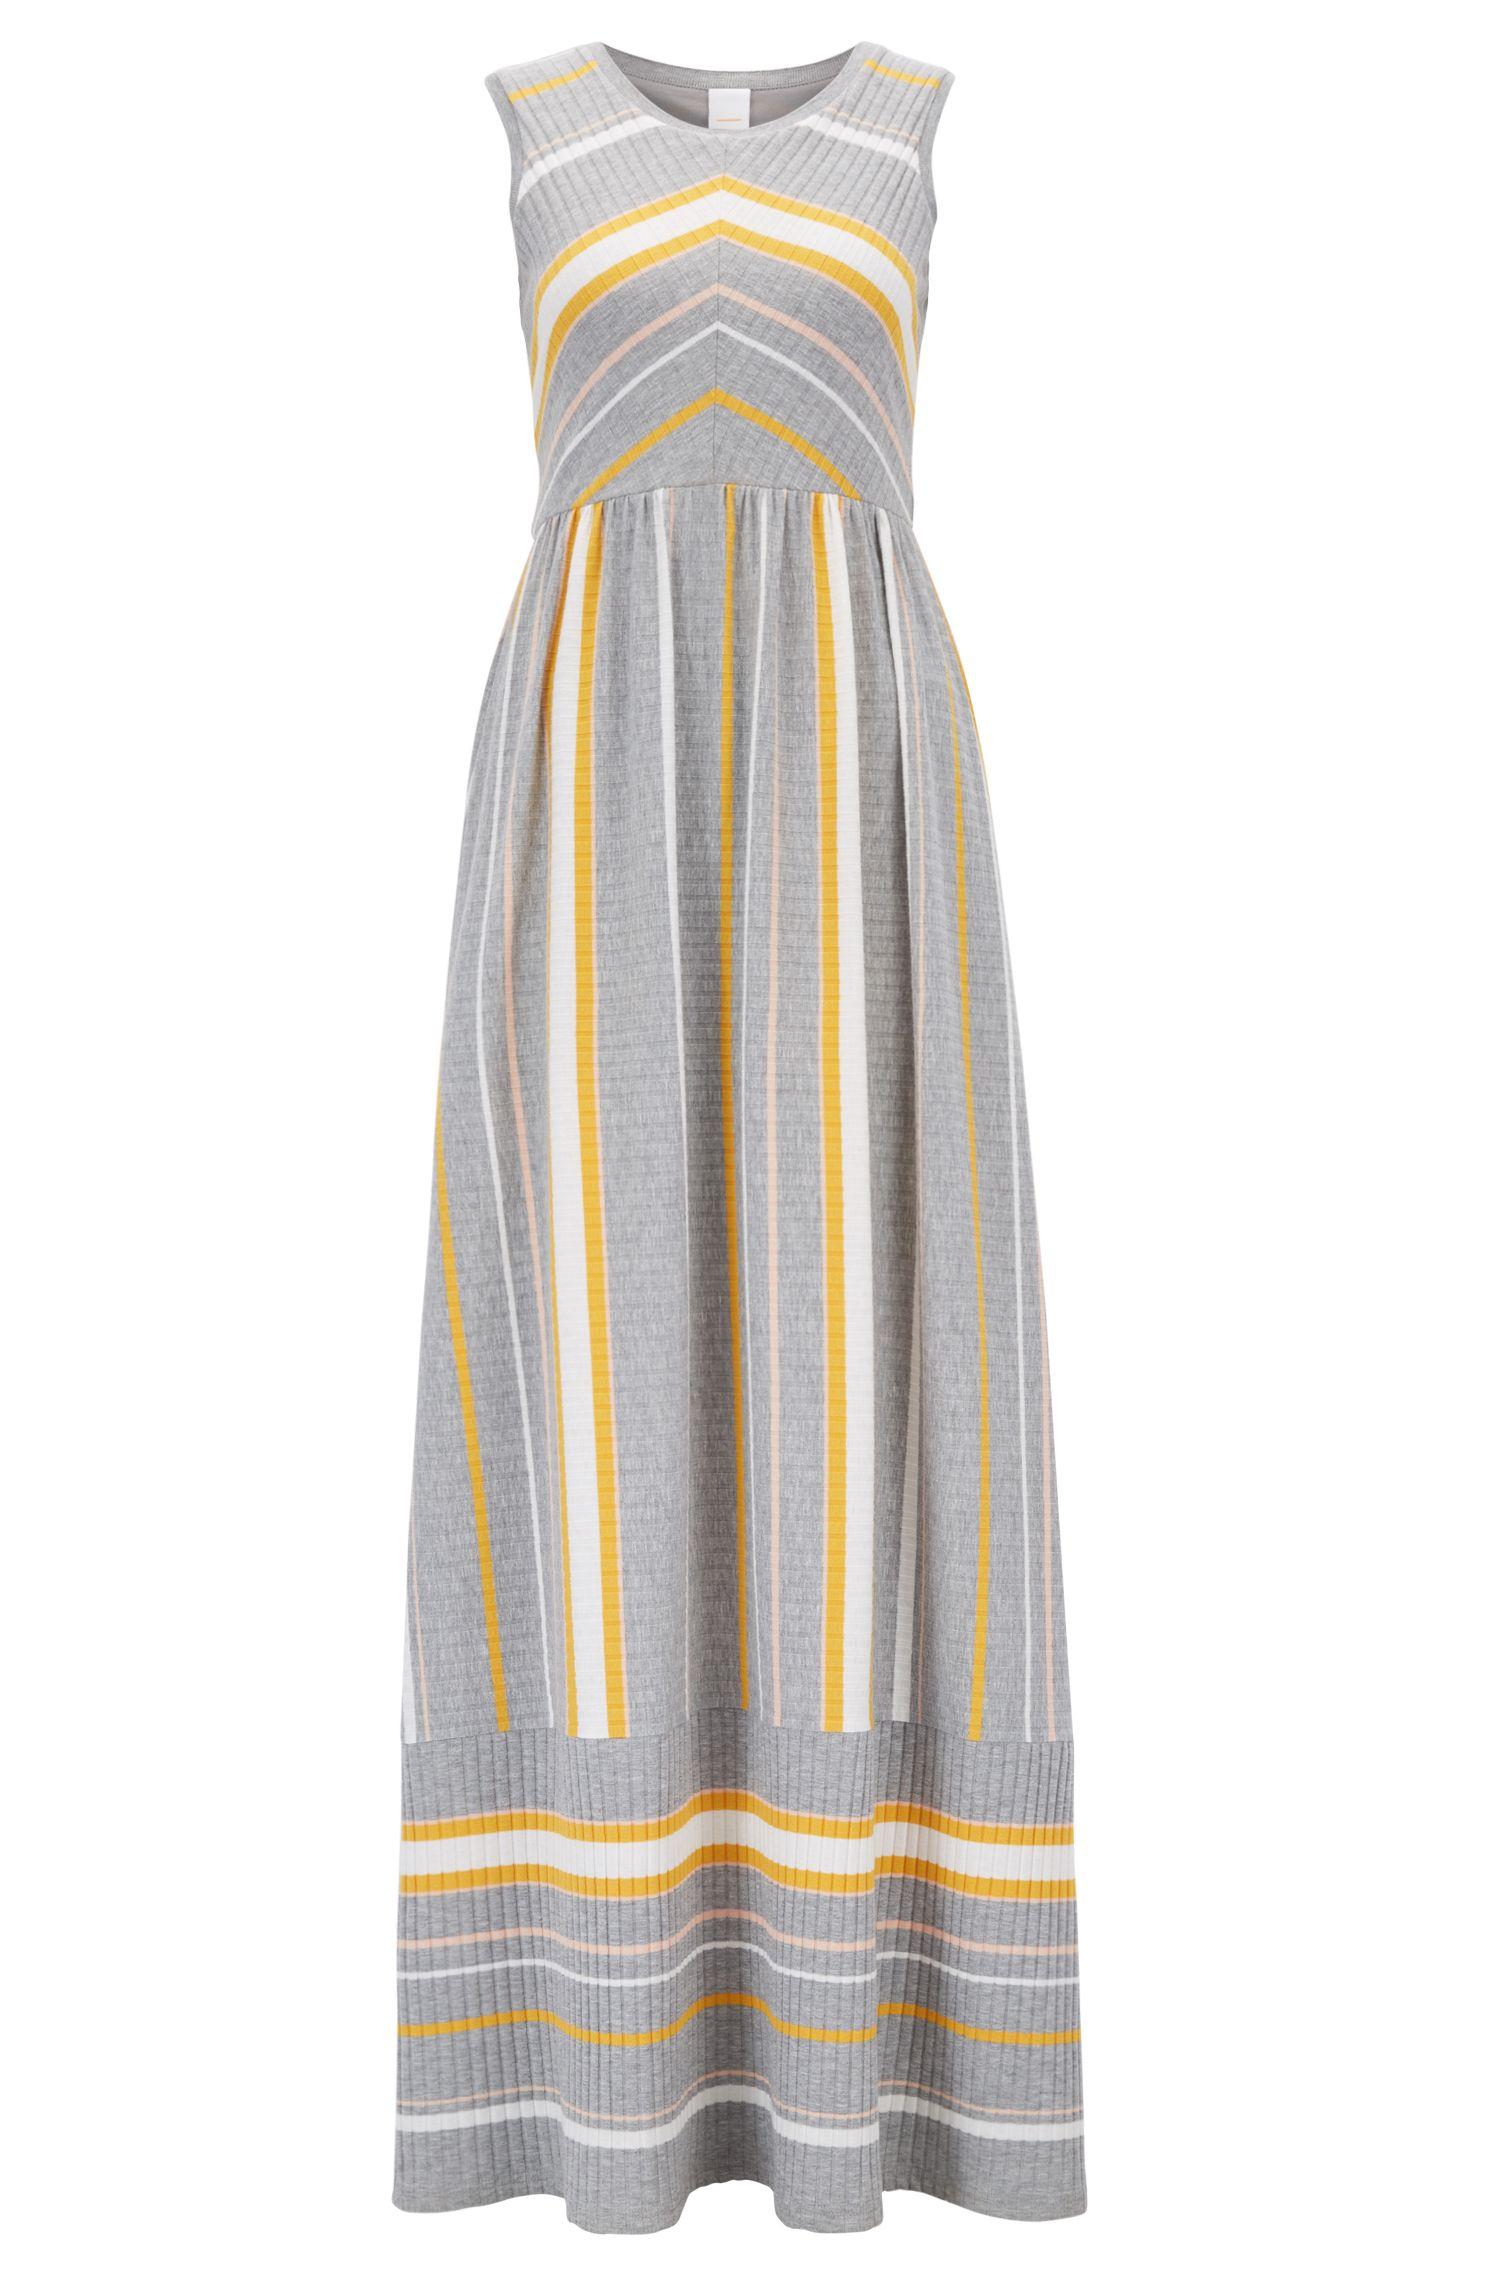 Sleeveless maxi dress with engineered stripe